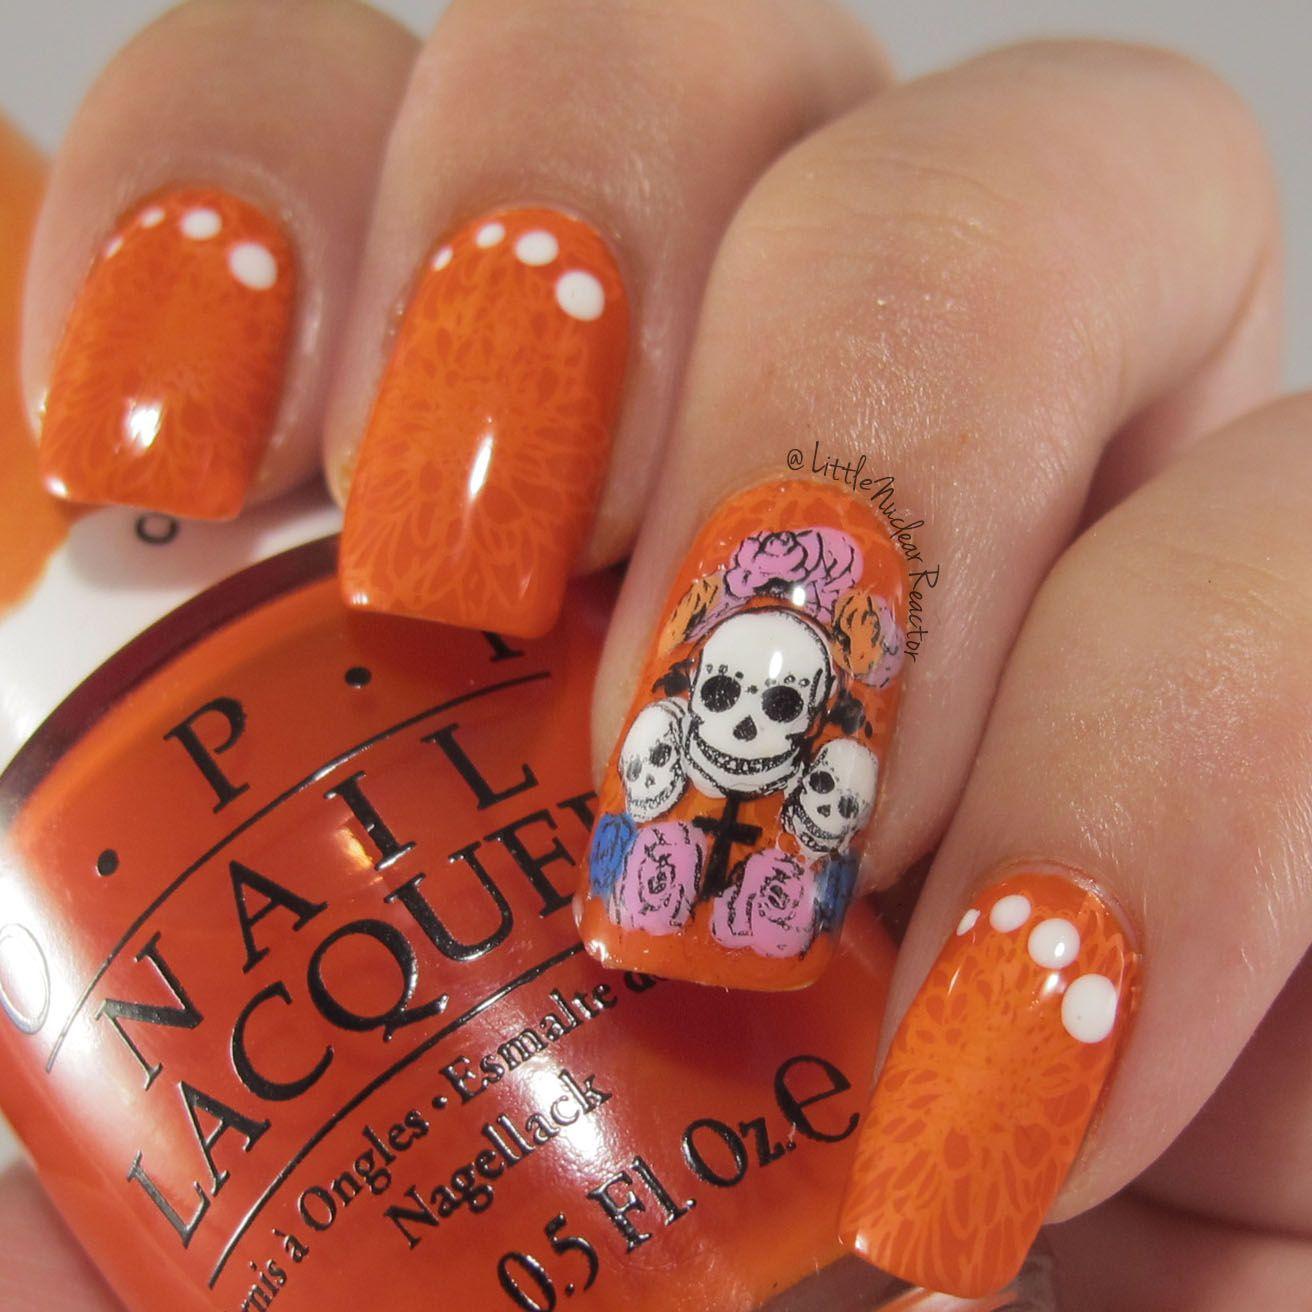 Dia De Los Muertos (Day of the Dead) Nail Art | Dia de and Manicure